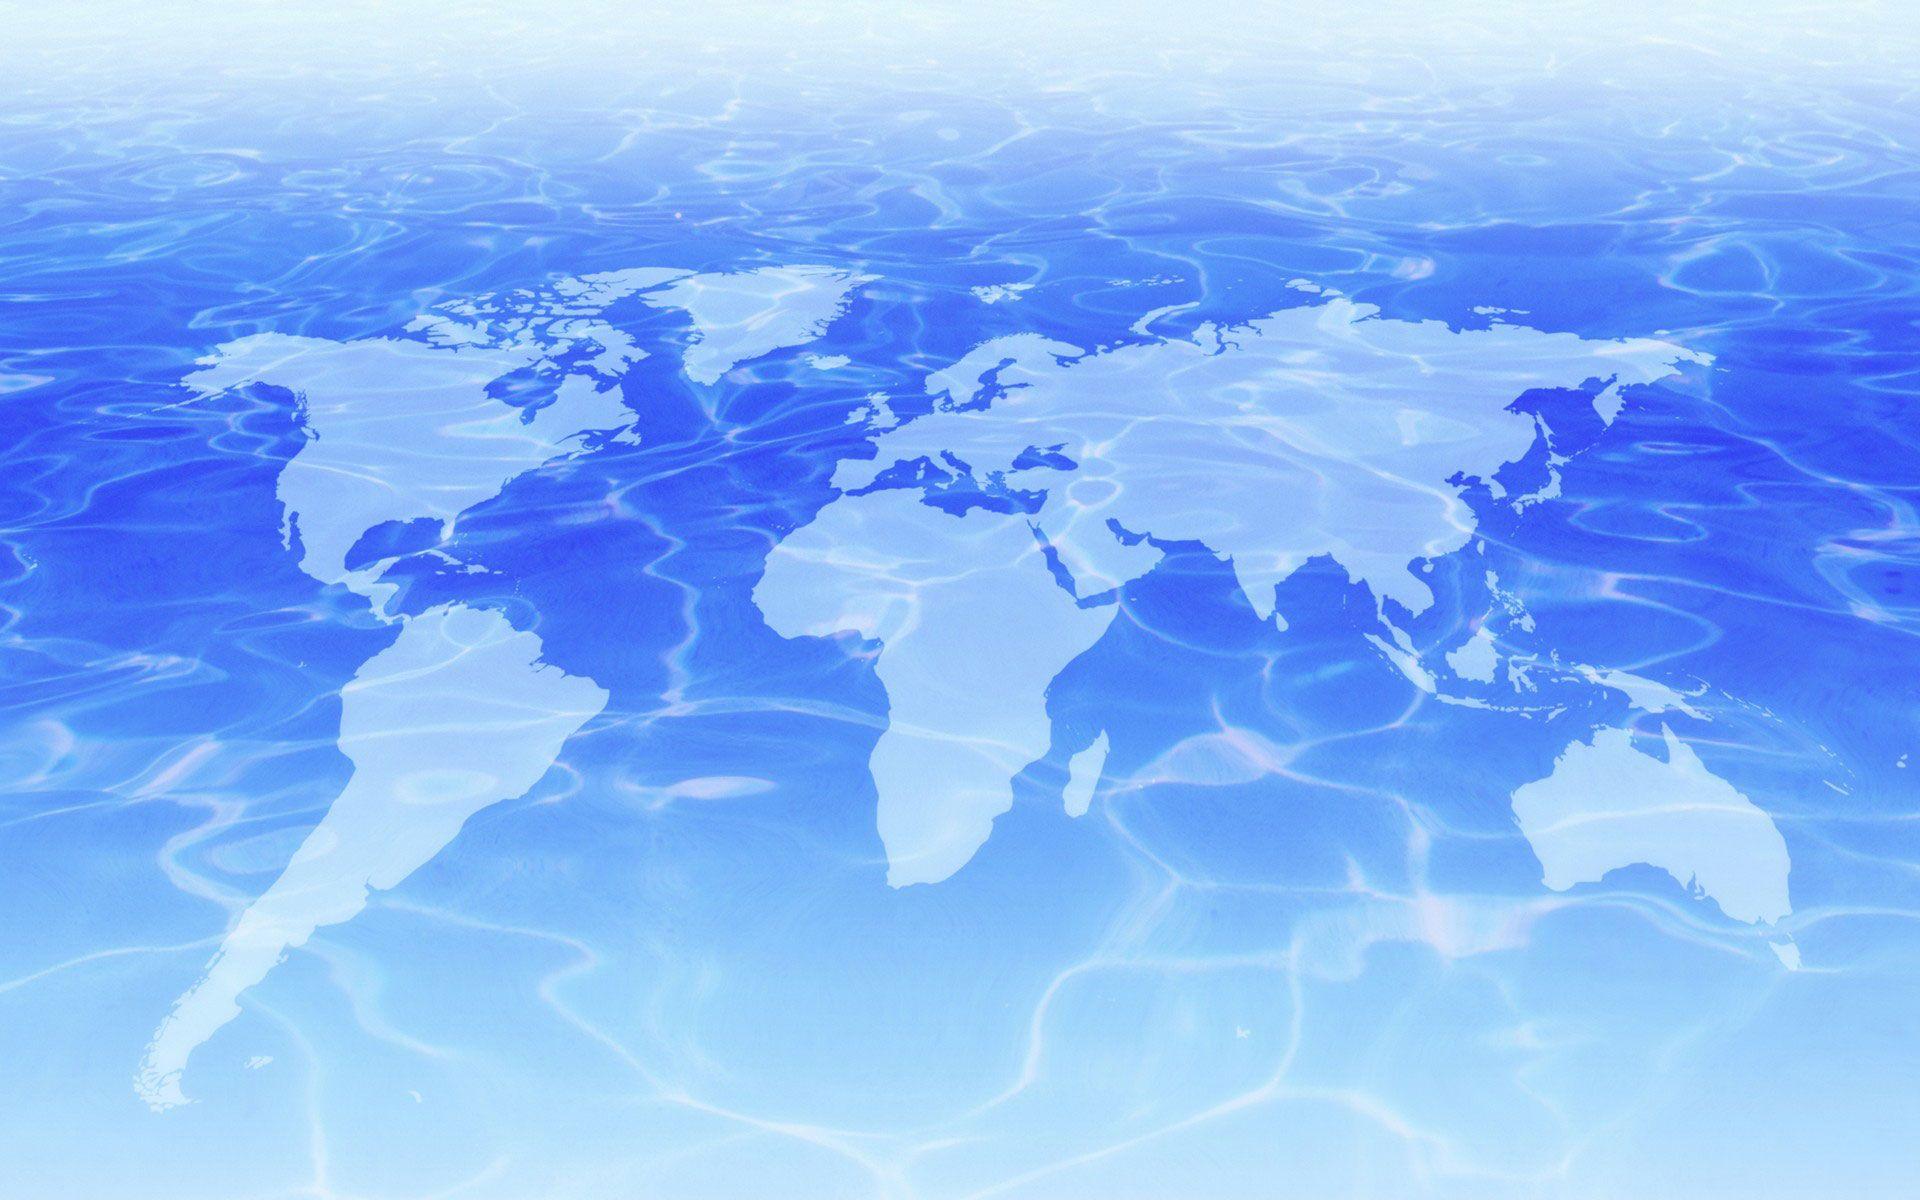 Windows7worldatlaspictureshdwallpaper World Map